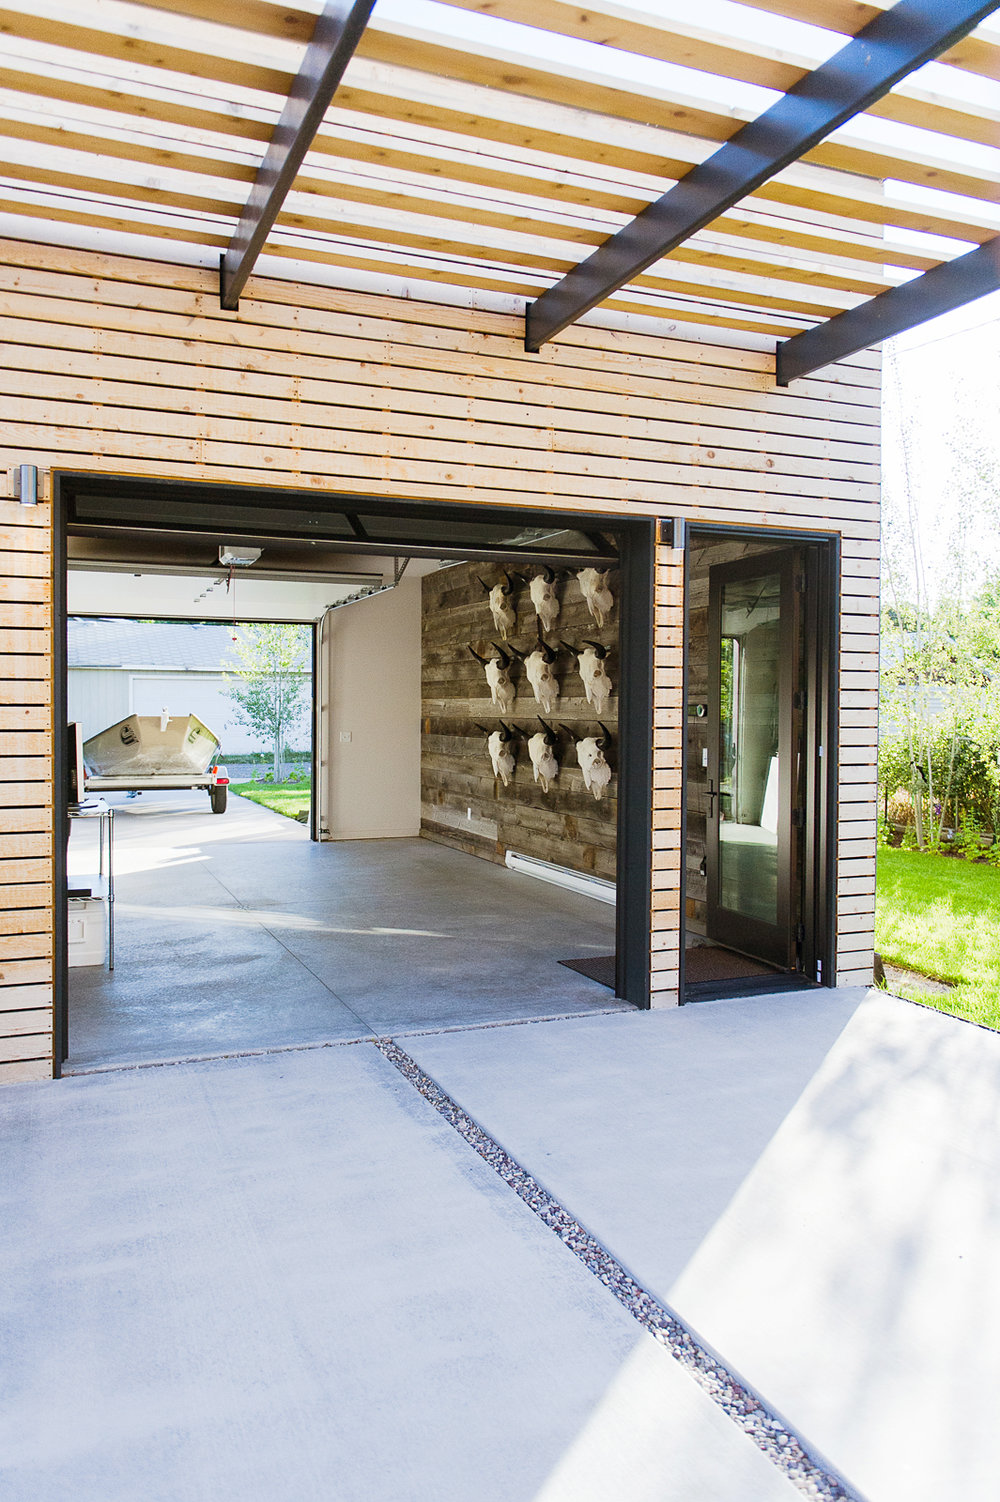 Woodworks-West-Bozeman-Montana-Builder-Cabinetry-Remodel-New-Construction-2612.jpg